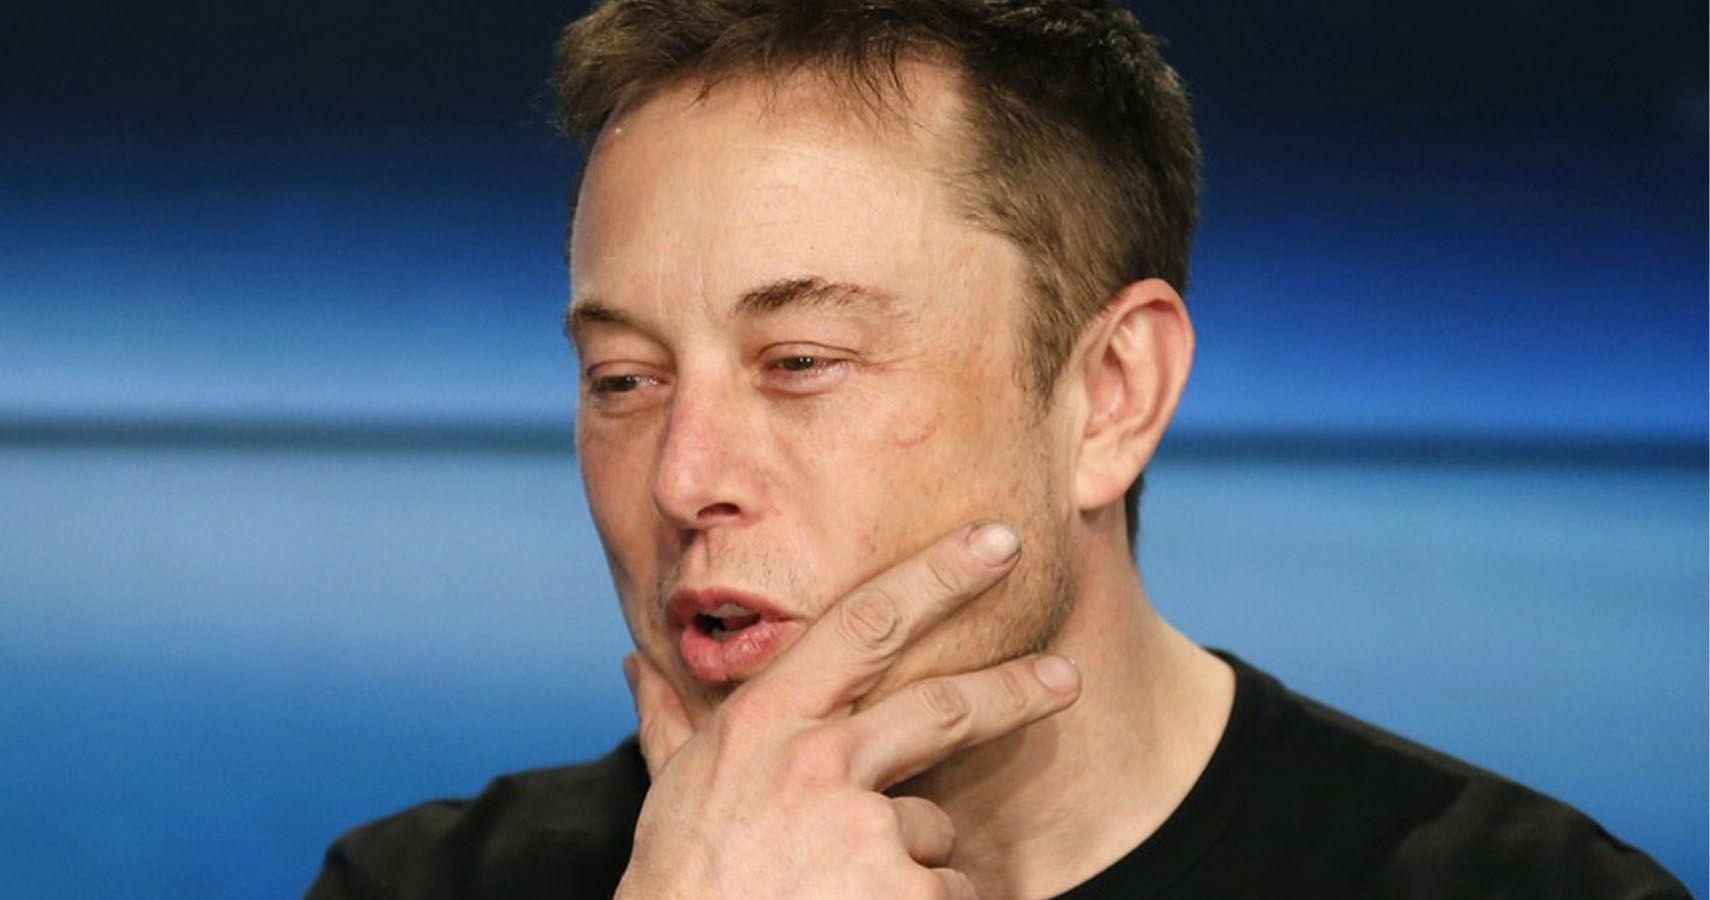 Elon Musk Reports Tesla Bought China's Excess Ventilators